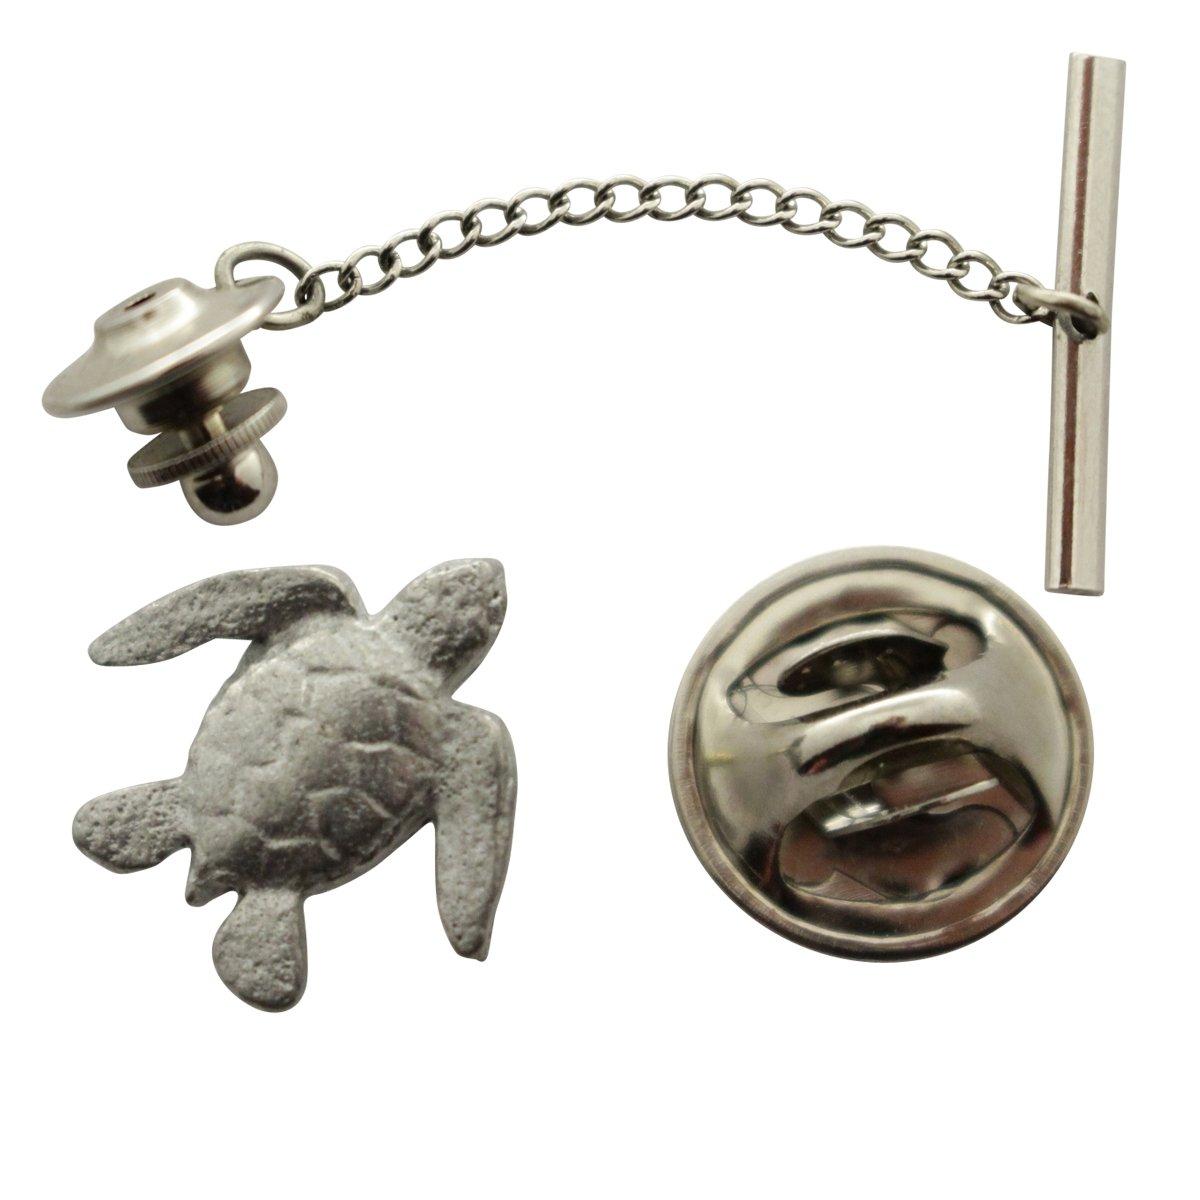 Sea Turtle Tie Tack ~ Antiqued Pewter ~ Tie Tack or Pin ~ Sarah's Treats & Treasures by Sarah's Treats & Treasures (Image #1)